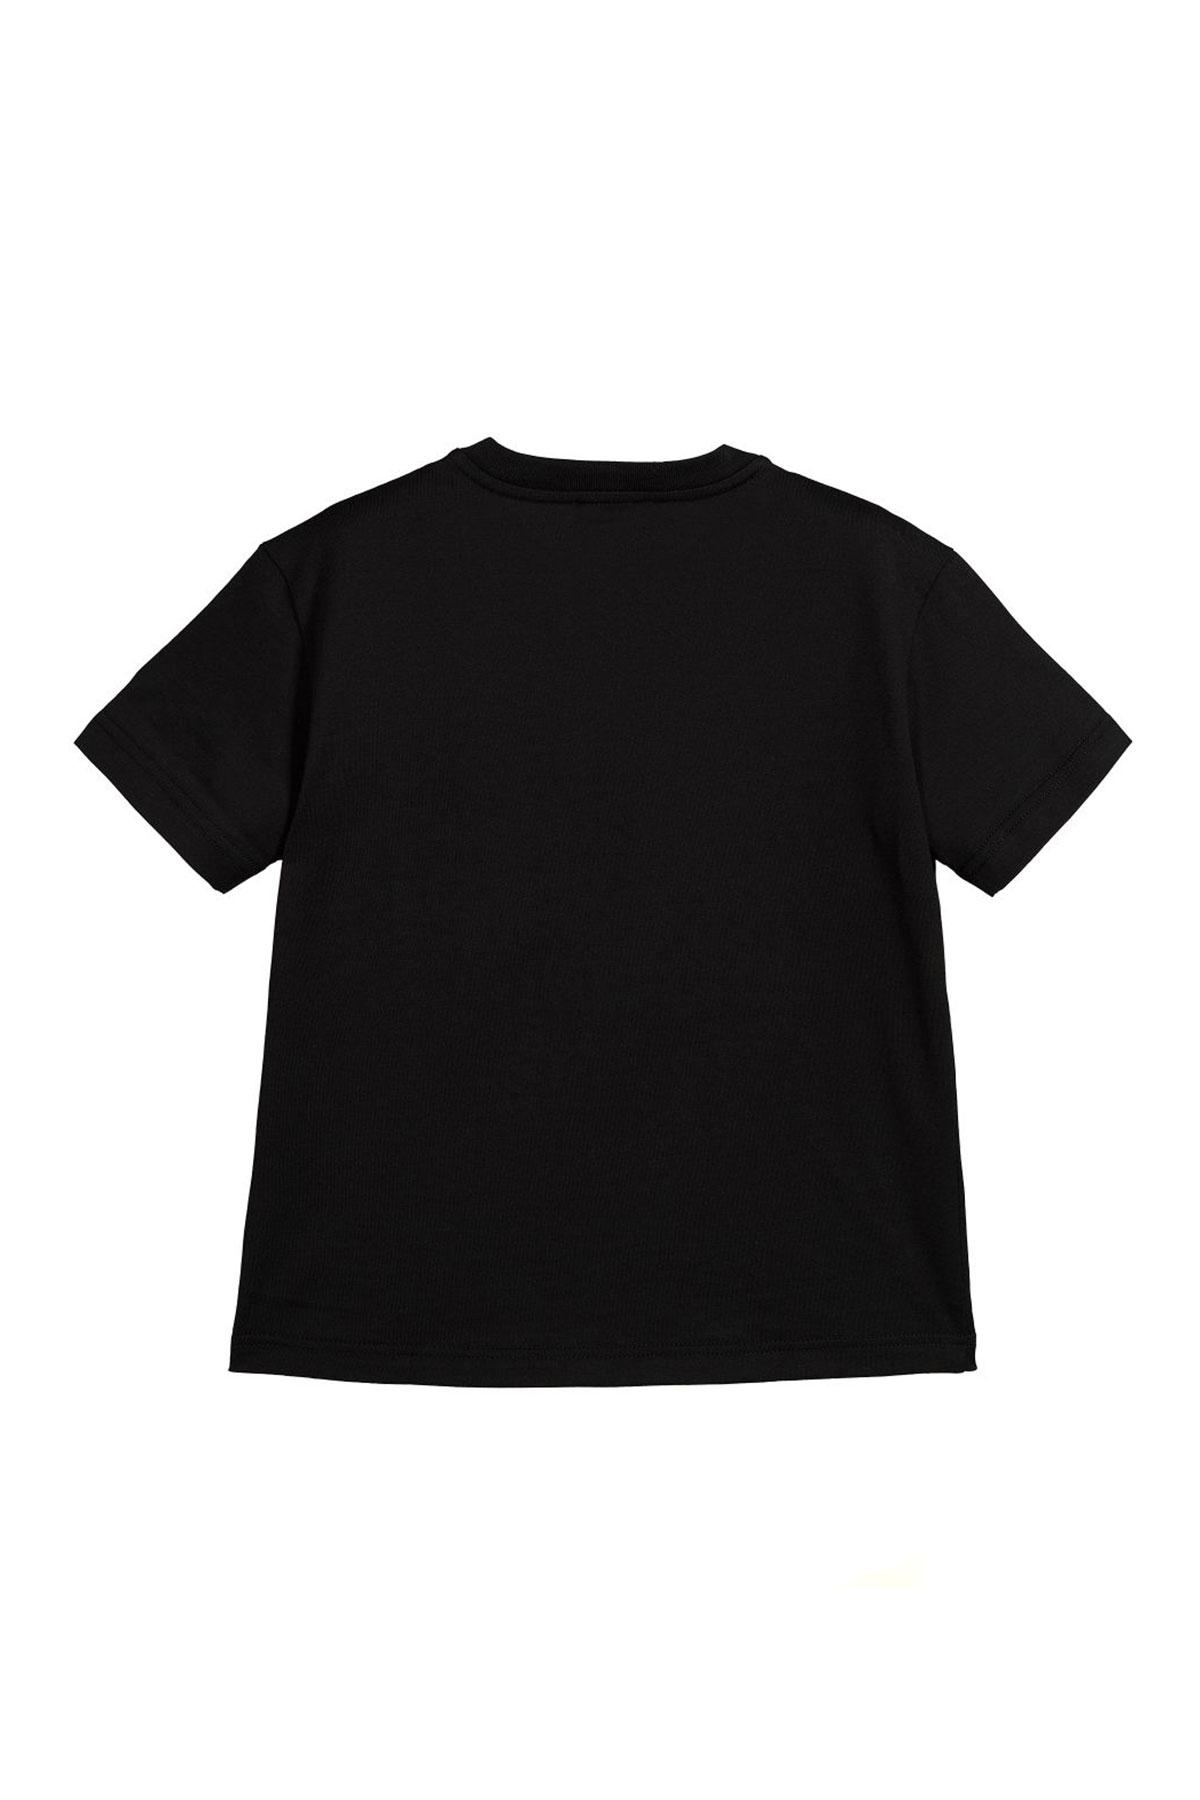 BLACK T-SHIRT DOLCE E GABBANA KIDS  Dolce & Gabbana kids | 8 | L4JT7NG7RIGN0000